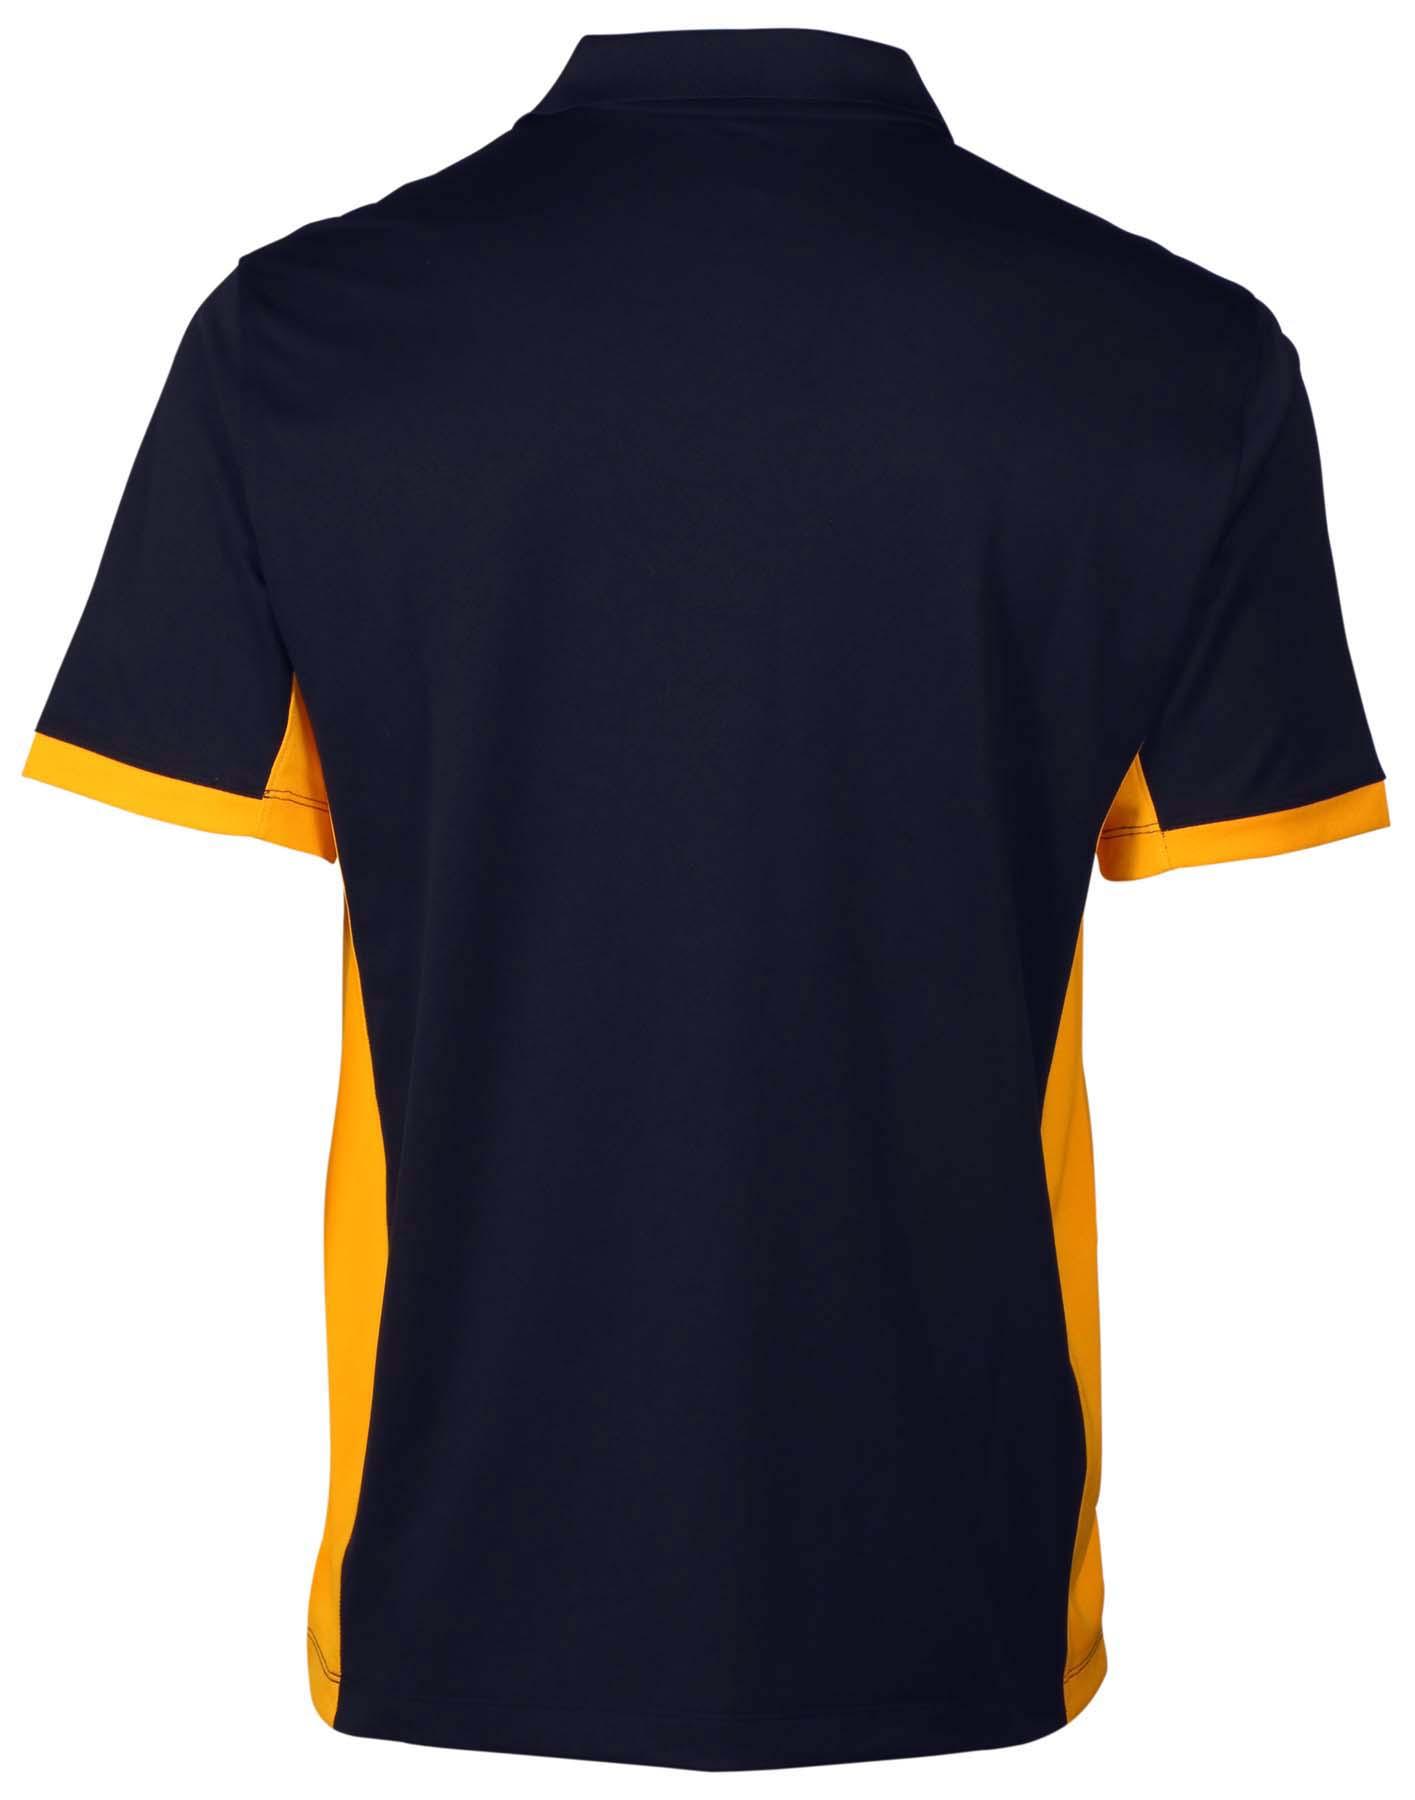 nike men 39 s dri fit performance sideline polo shirt ebay